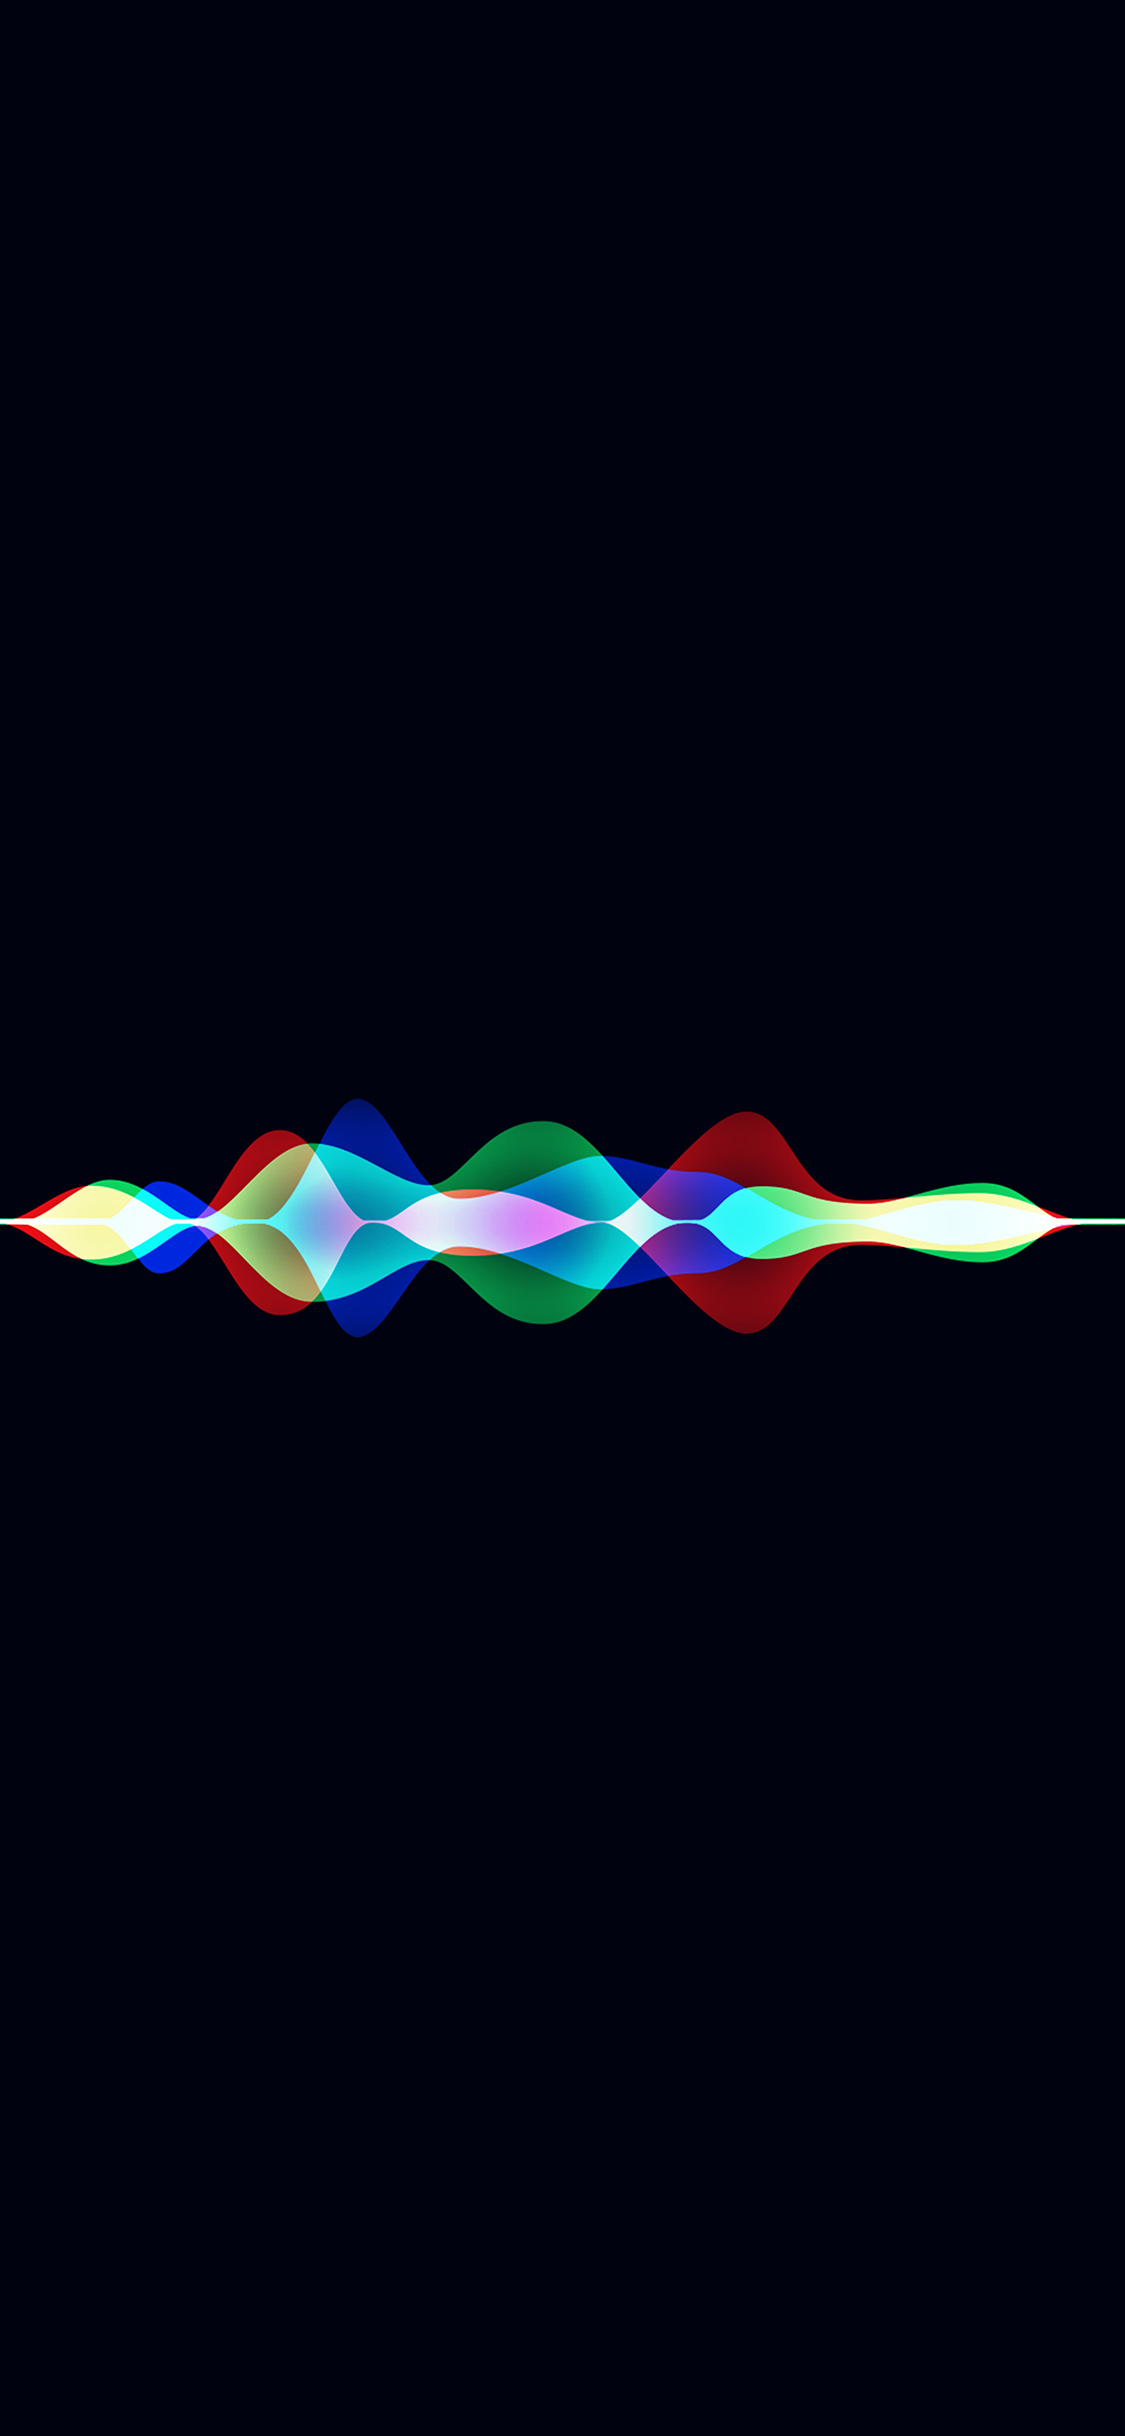 Iphonexpapers Com Iphone X Wallpaper Vq05 Siri Dark Rainbow